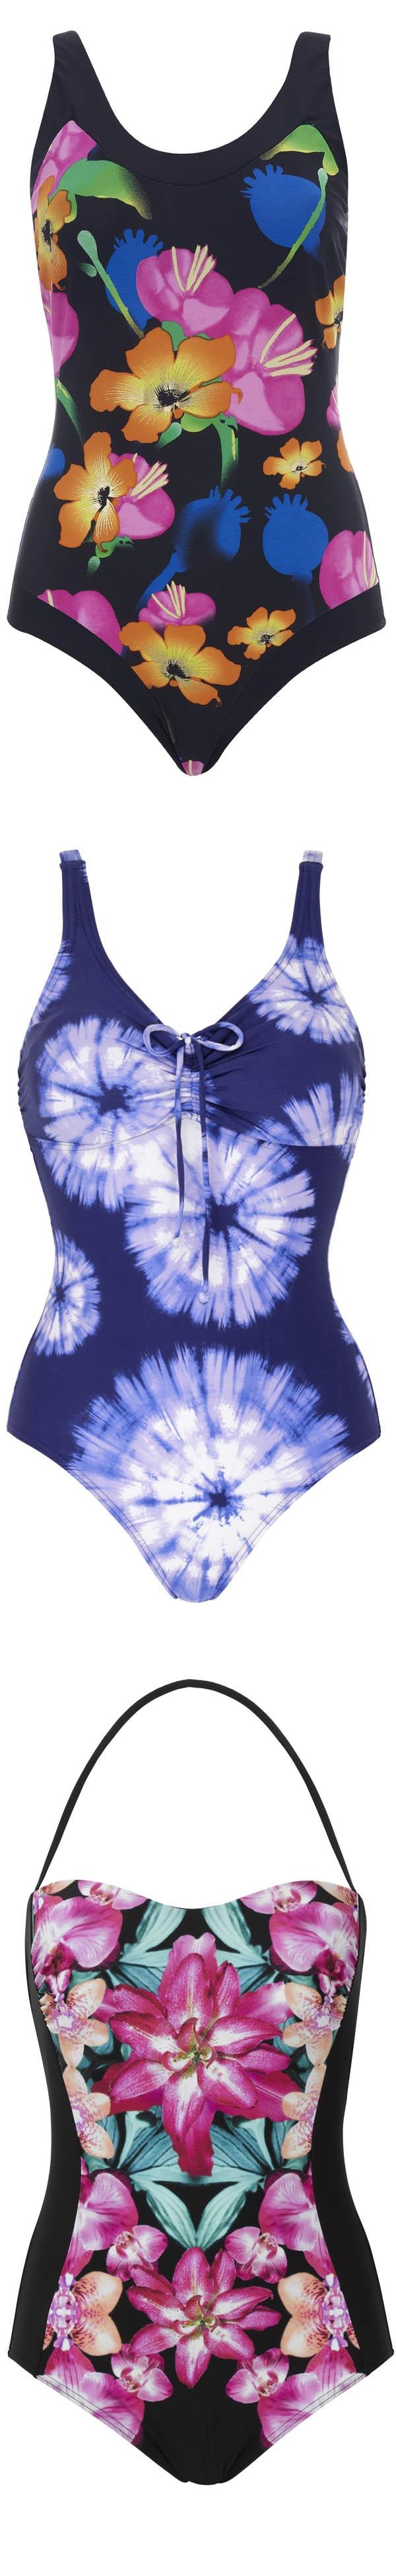 140 Best  Best Swimsuits For Older Women Over 40, 50, 60 -8642